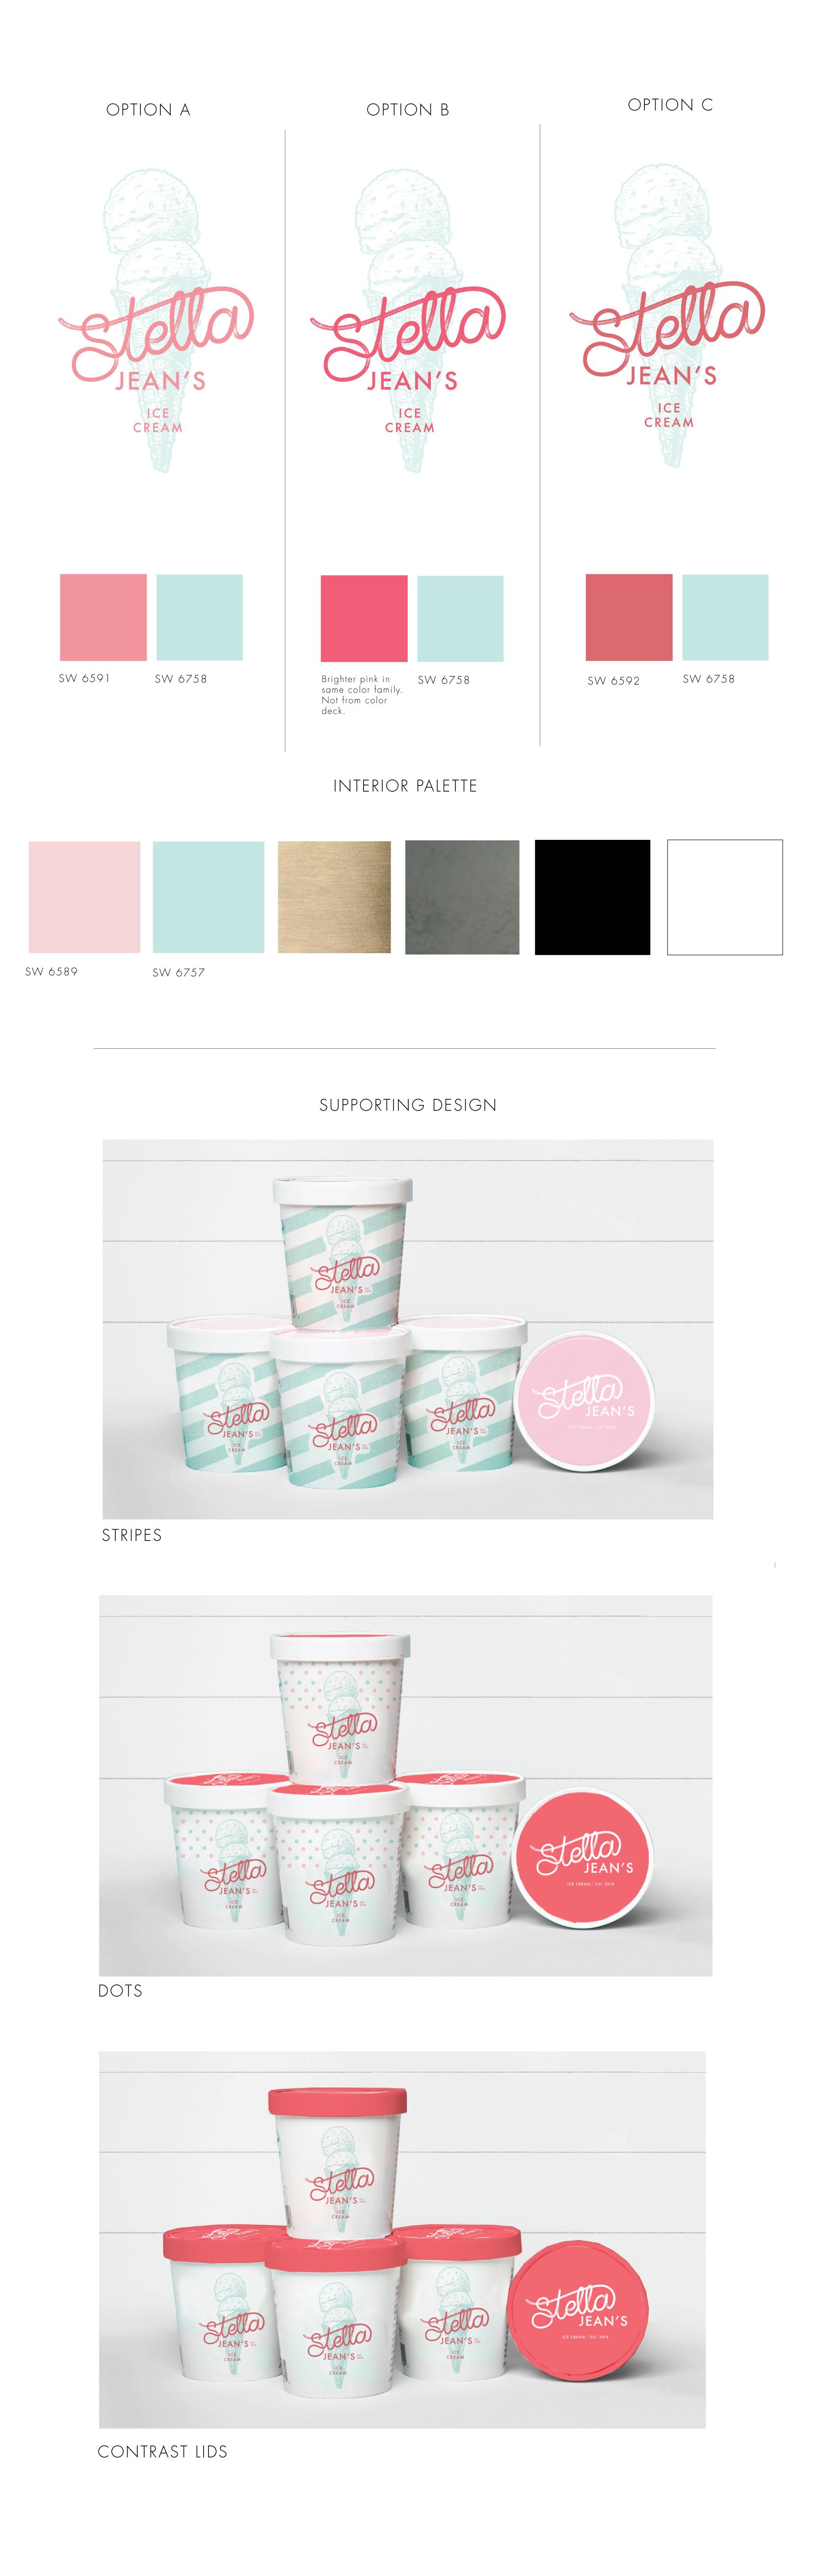 Stella-Jean's-Ice-cream-shop_May-17.jpg